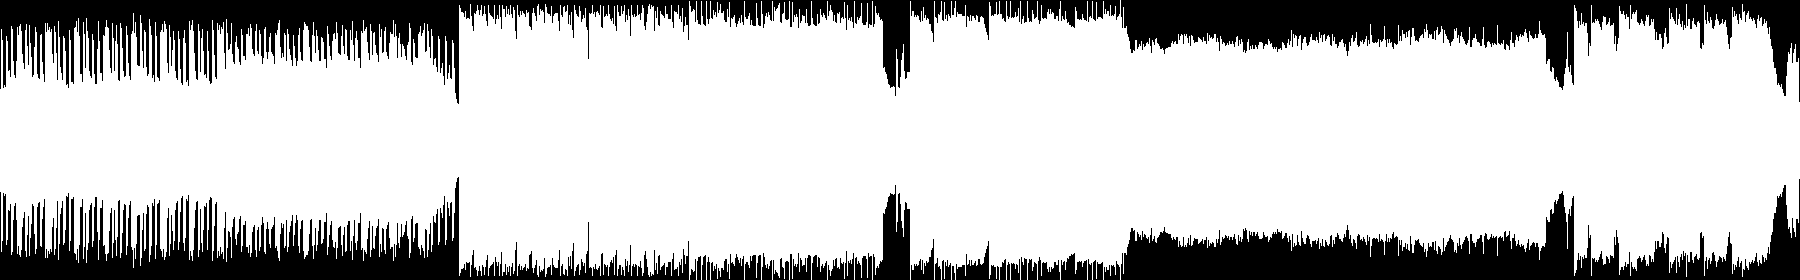 Calder Nest audio waveform